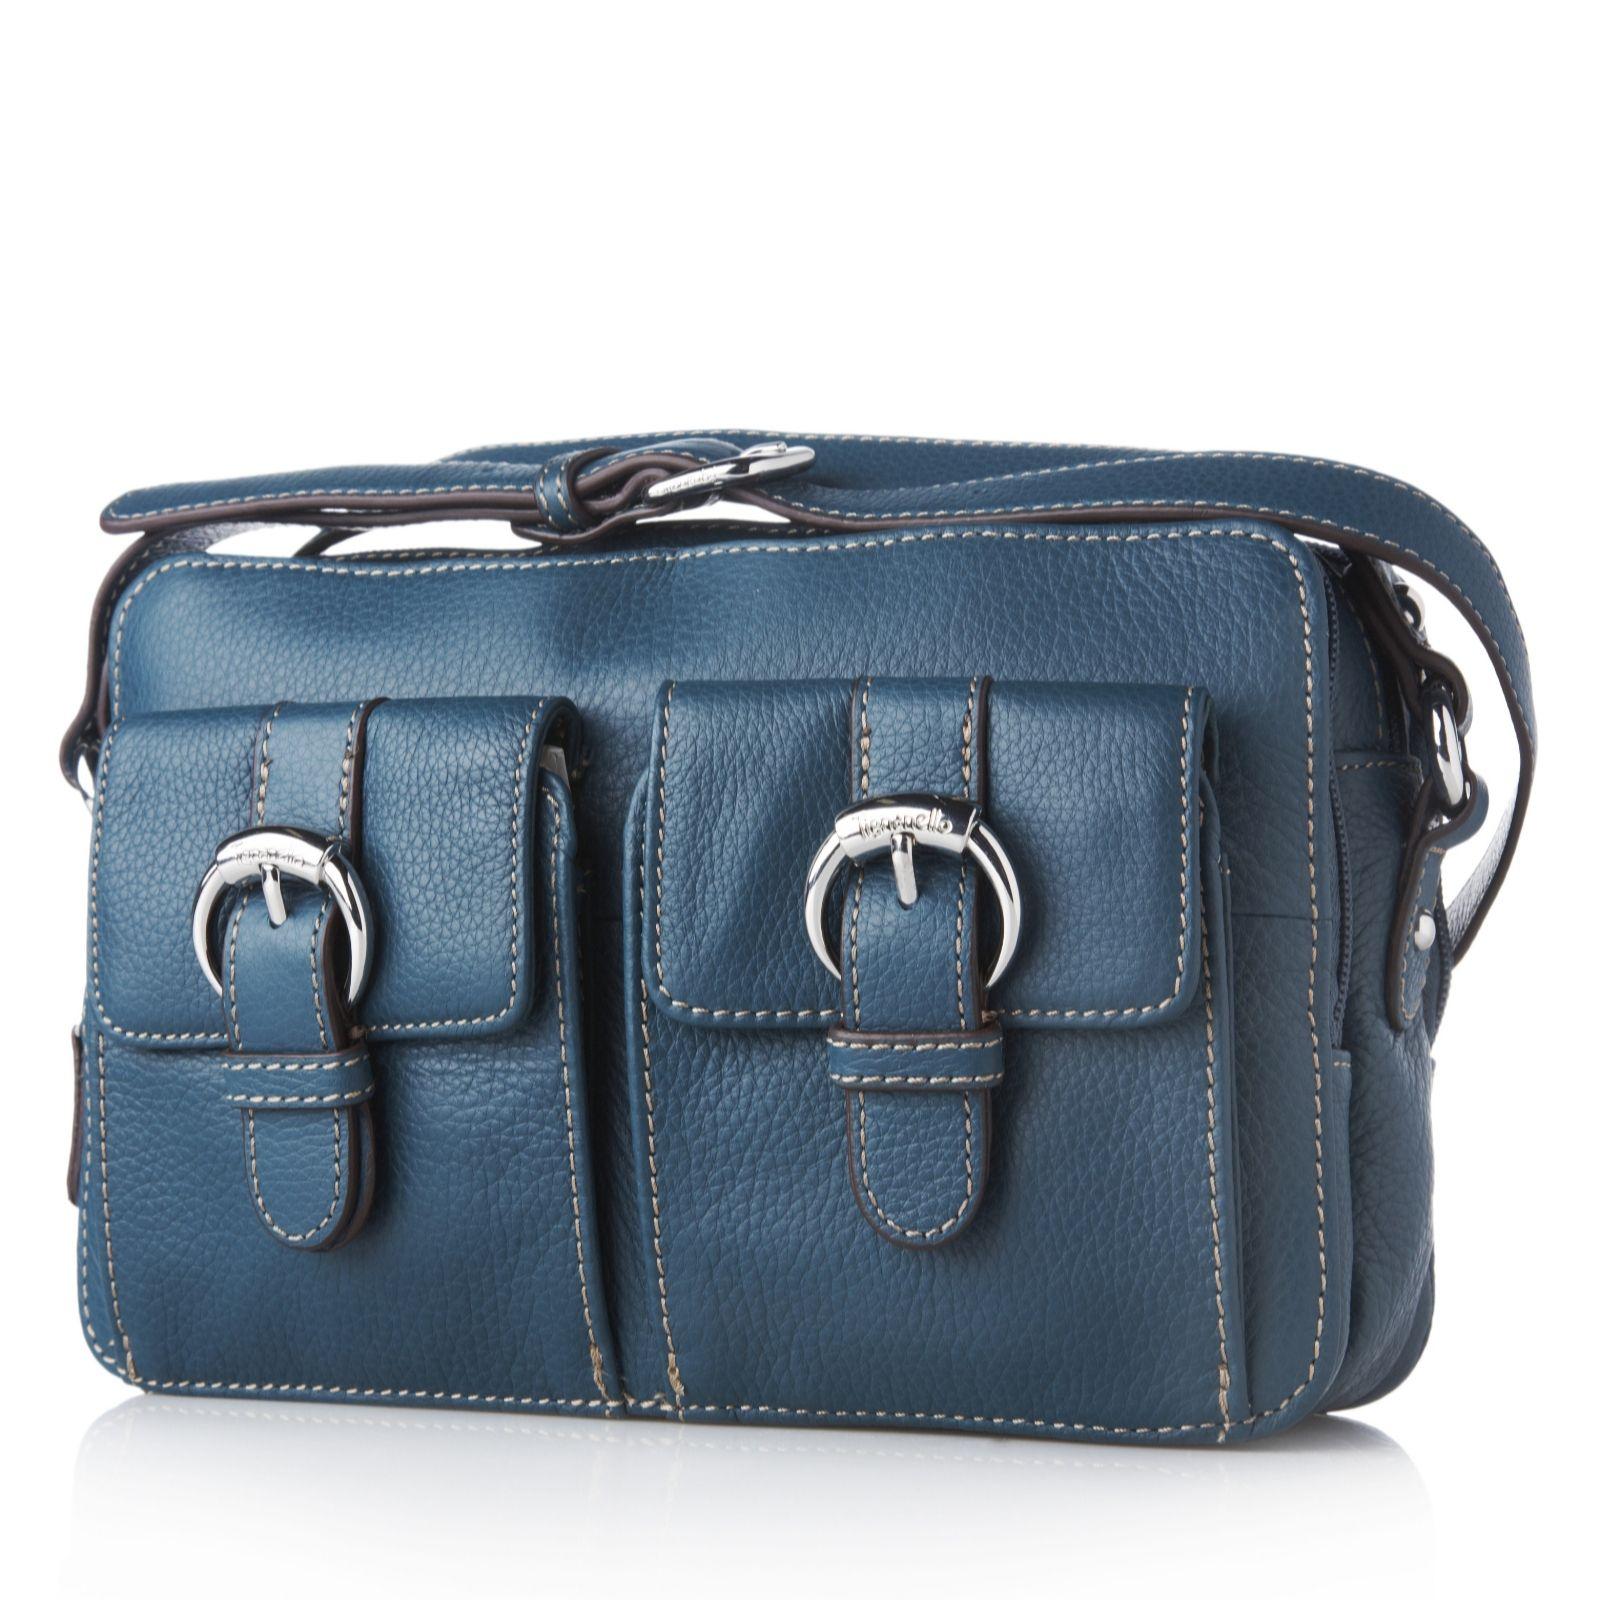 45023bfbf9 Tignanello Pebble Leather Organiser Cross Body Bag - QVC UK